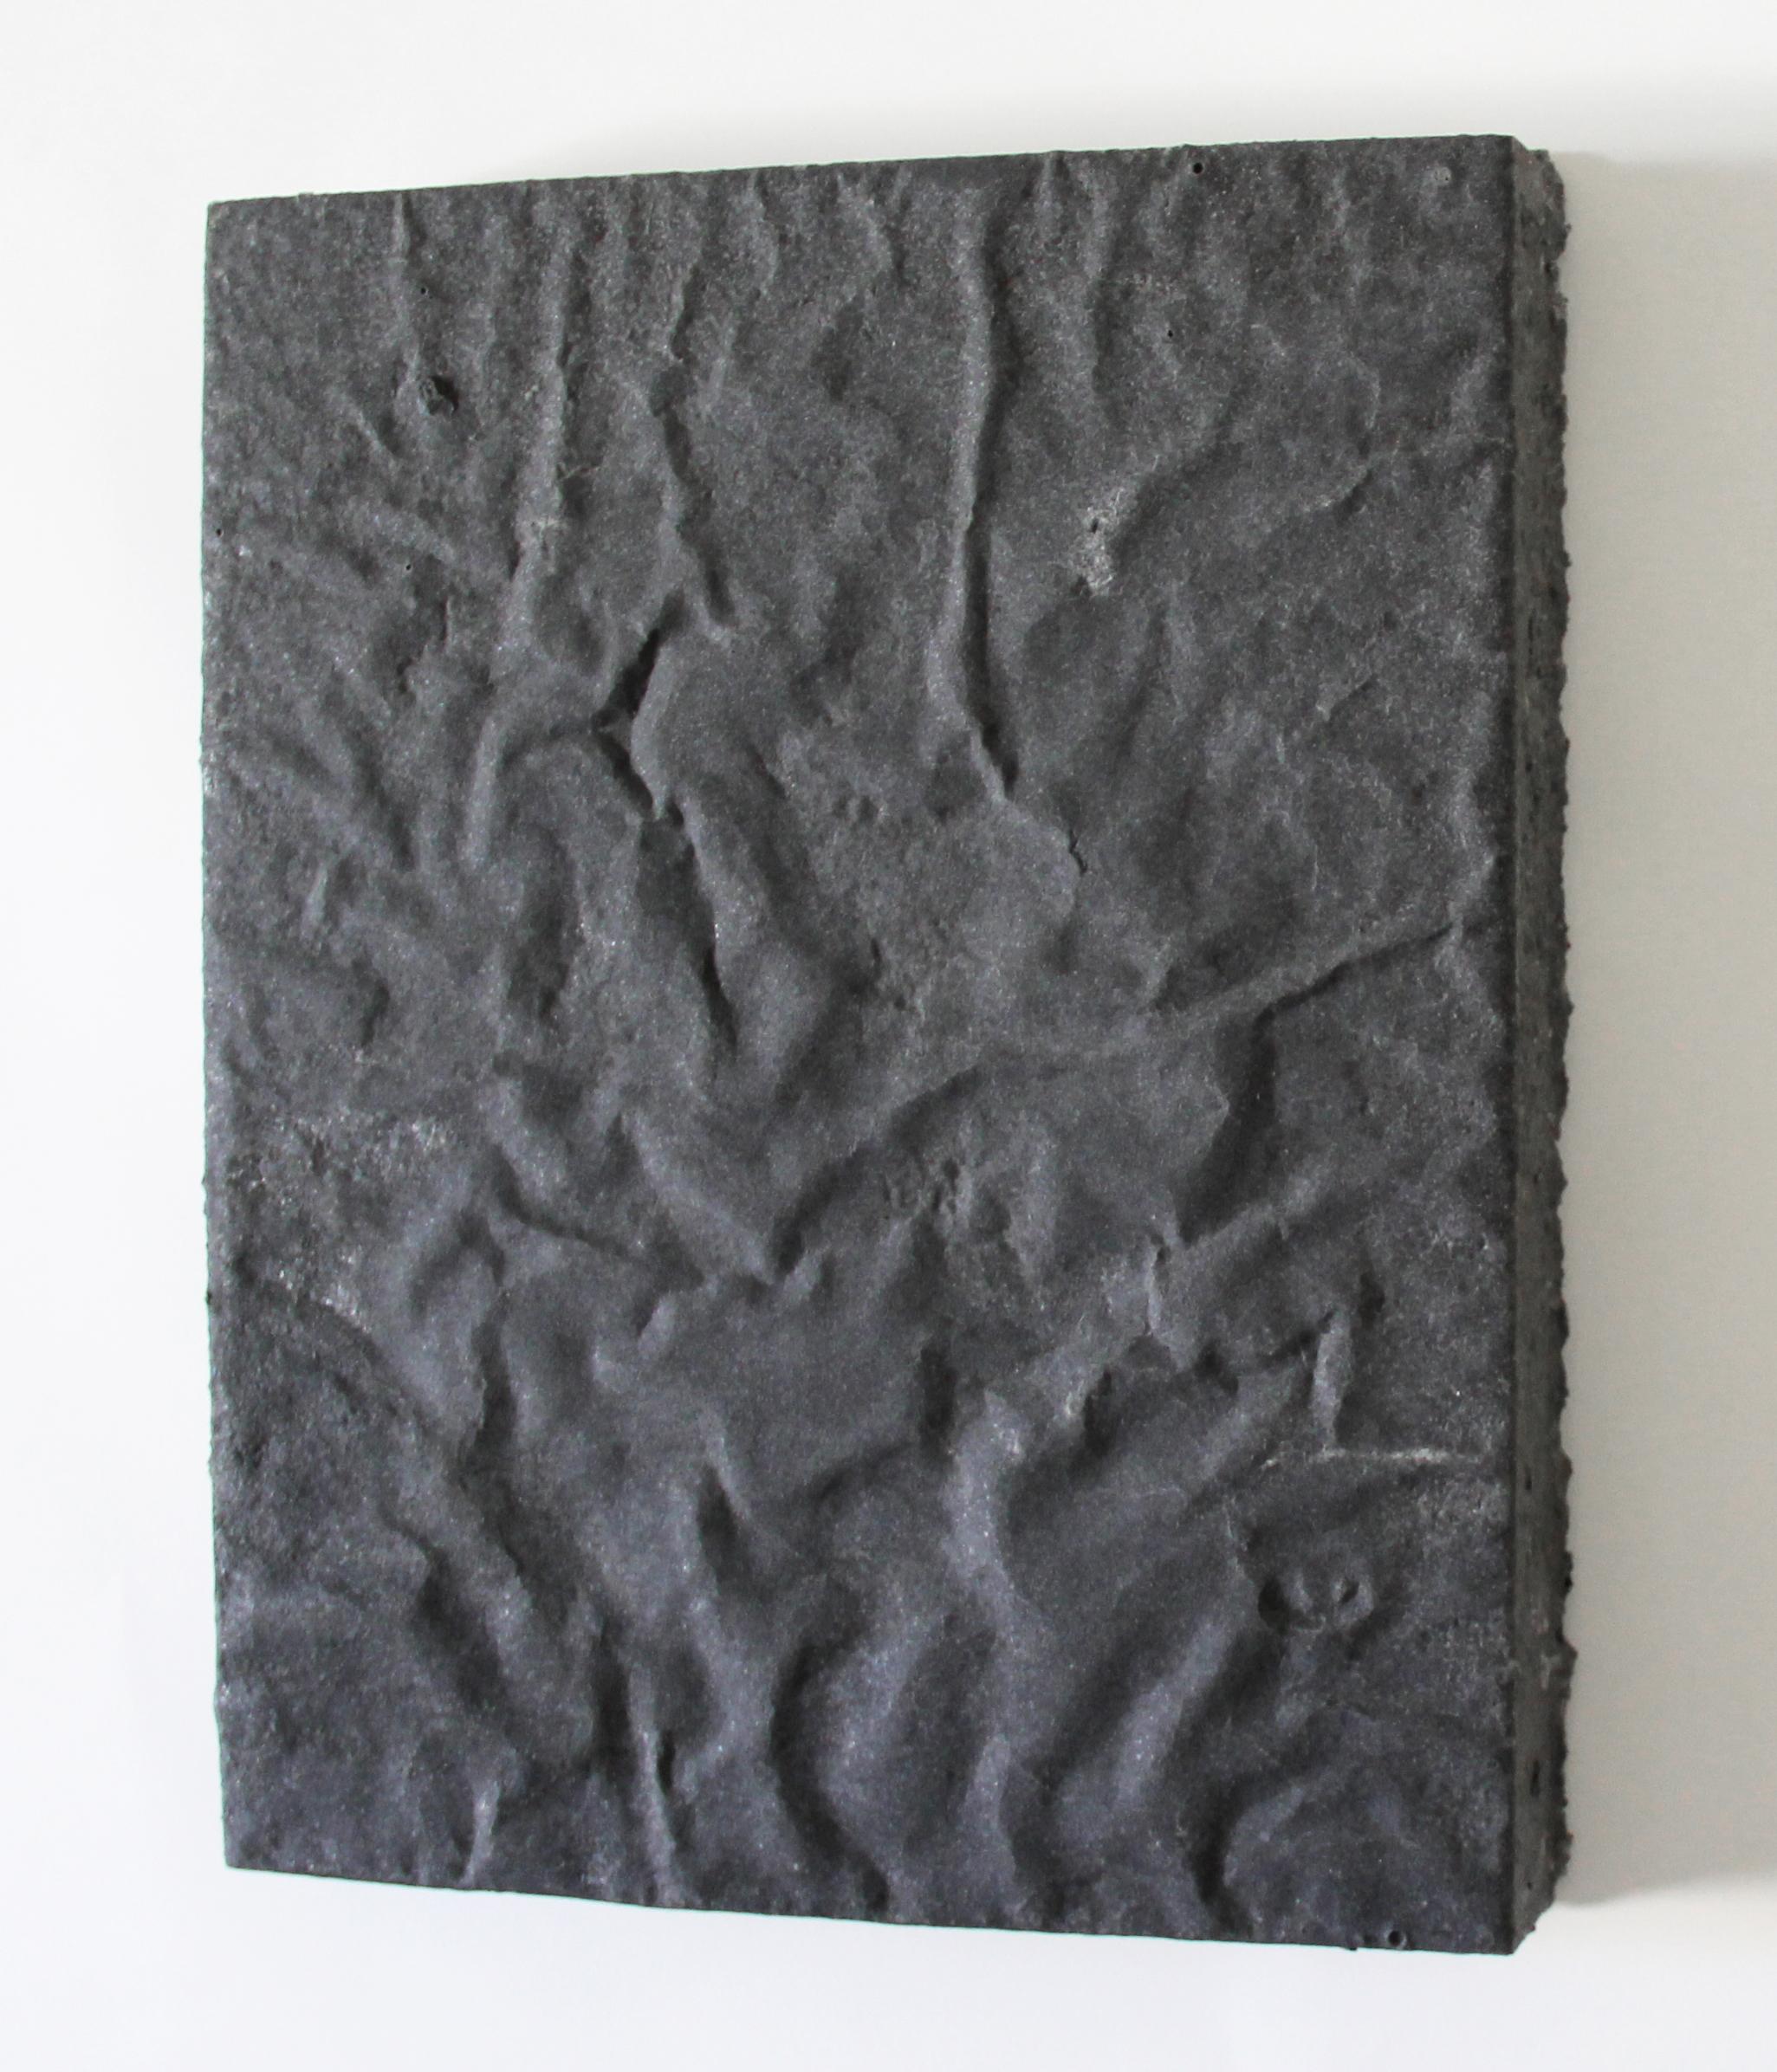 graphite1 2014  graphite, sugar, acrylic on wood  14 x 11 x 0.75 inches